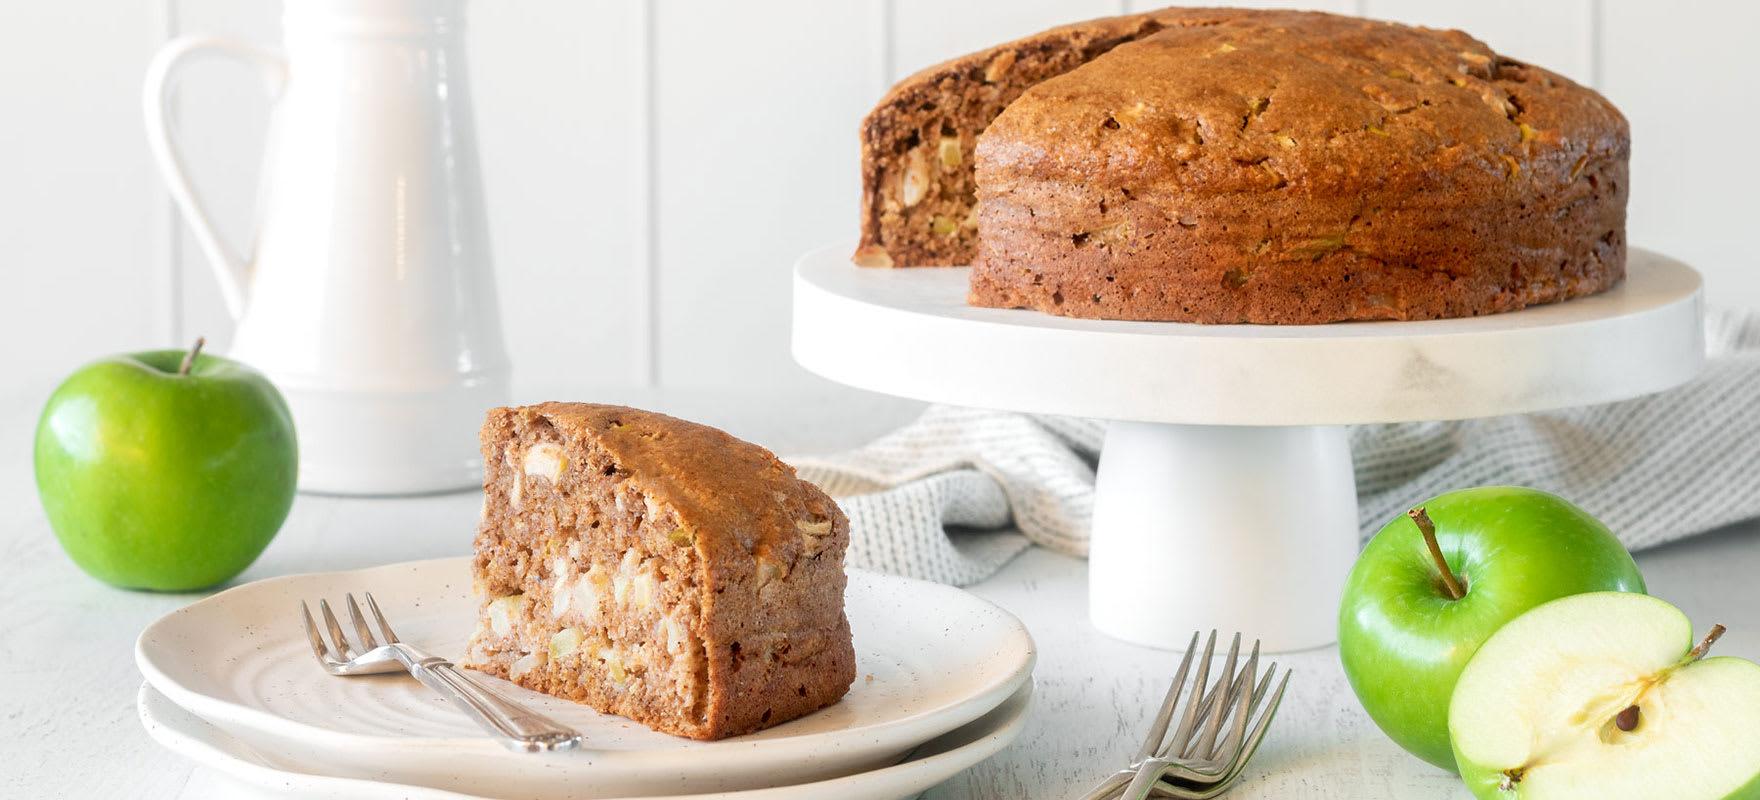 Spiced apple cake image 1